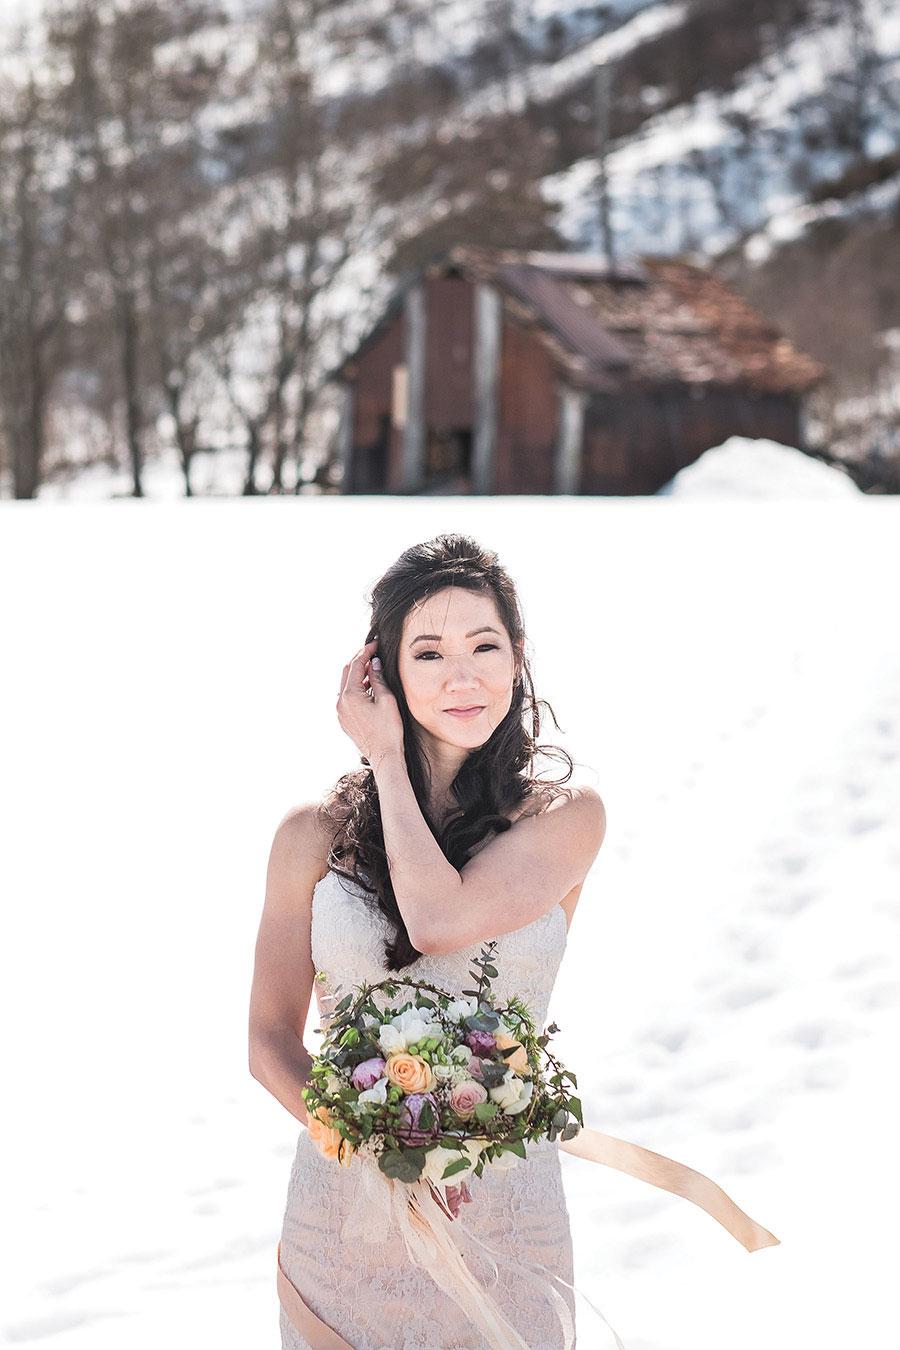 breathtaking-scenic-wedding-in-norway20160914_0145